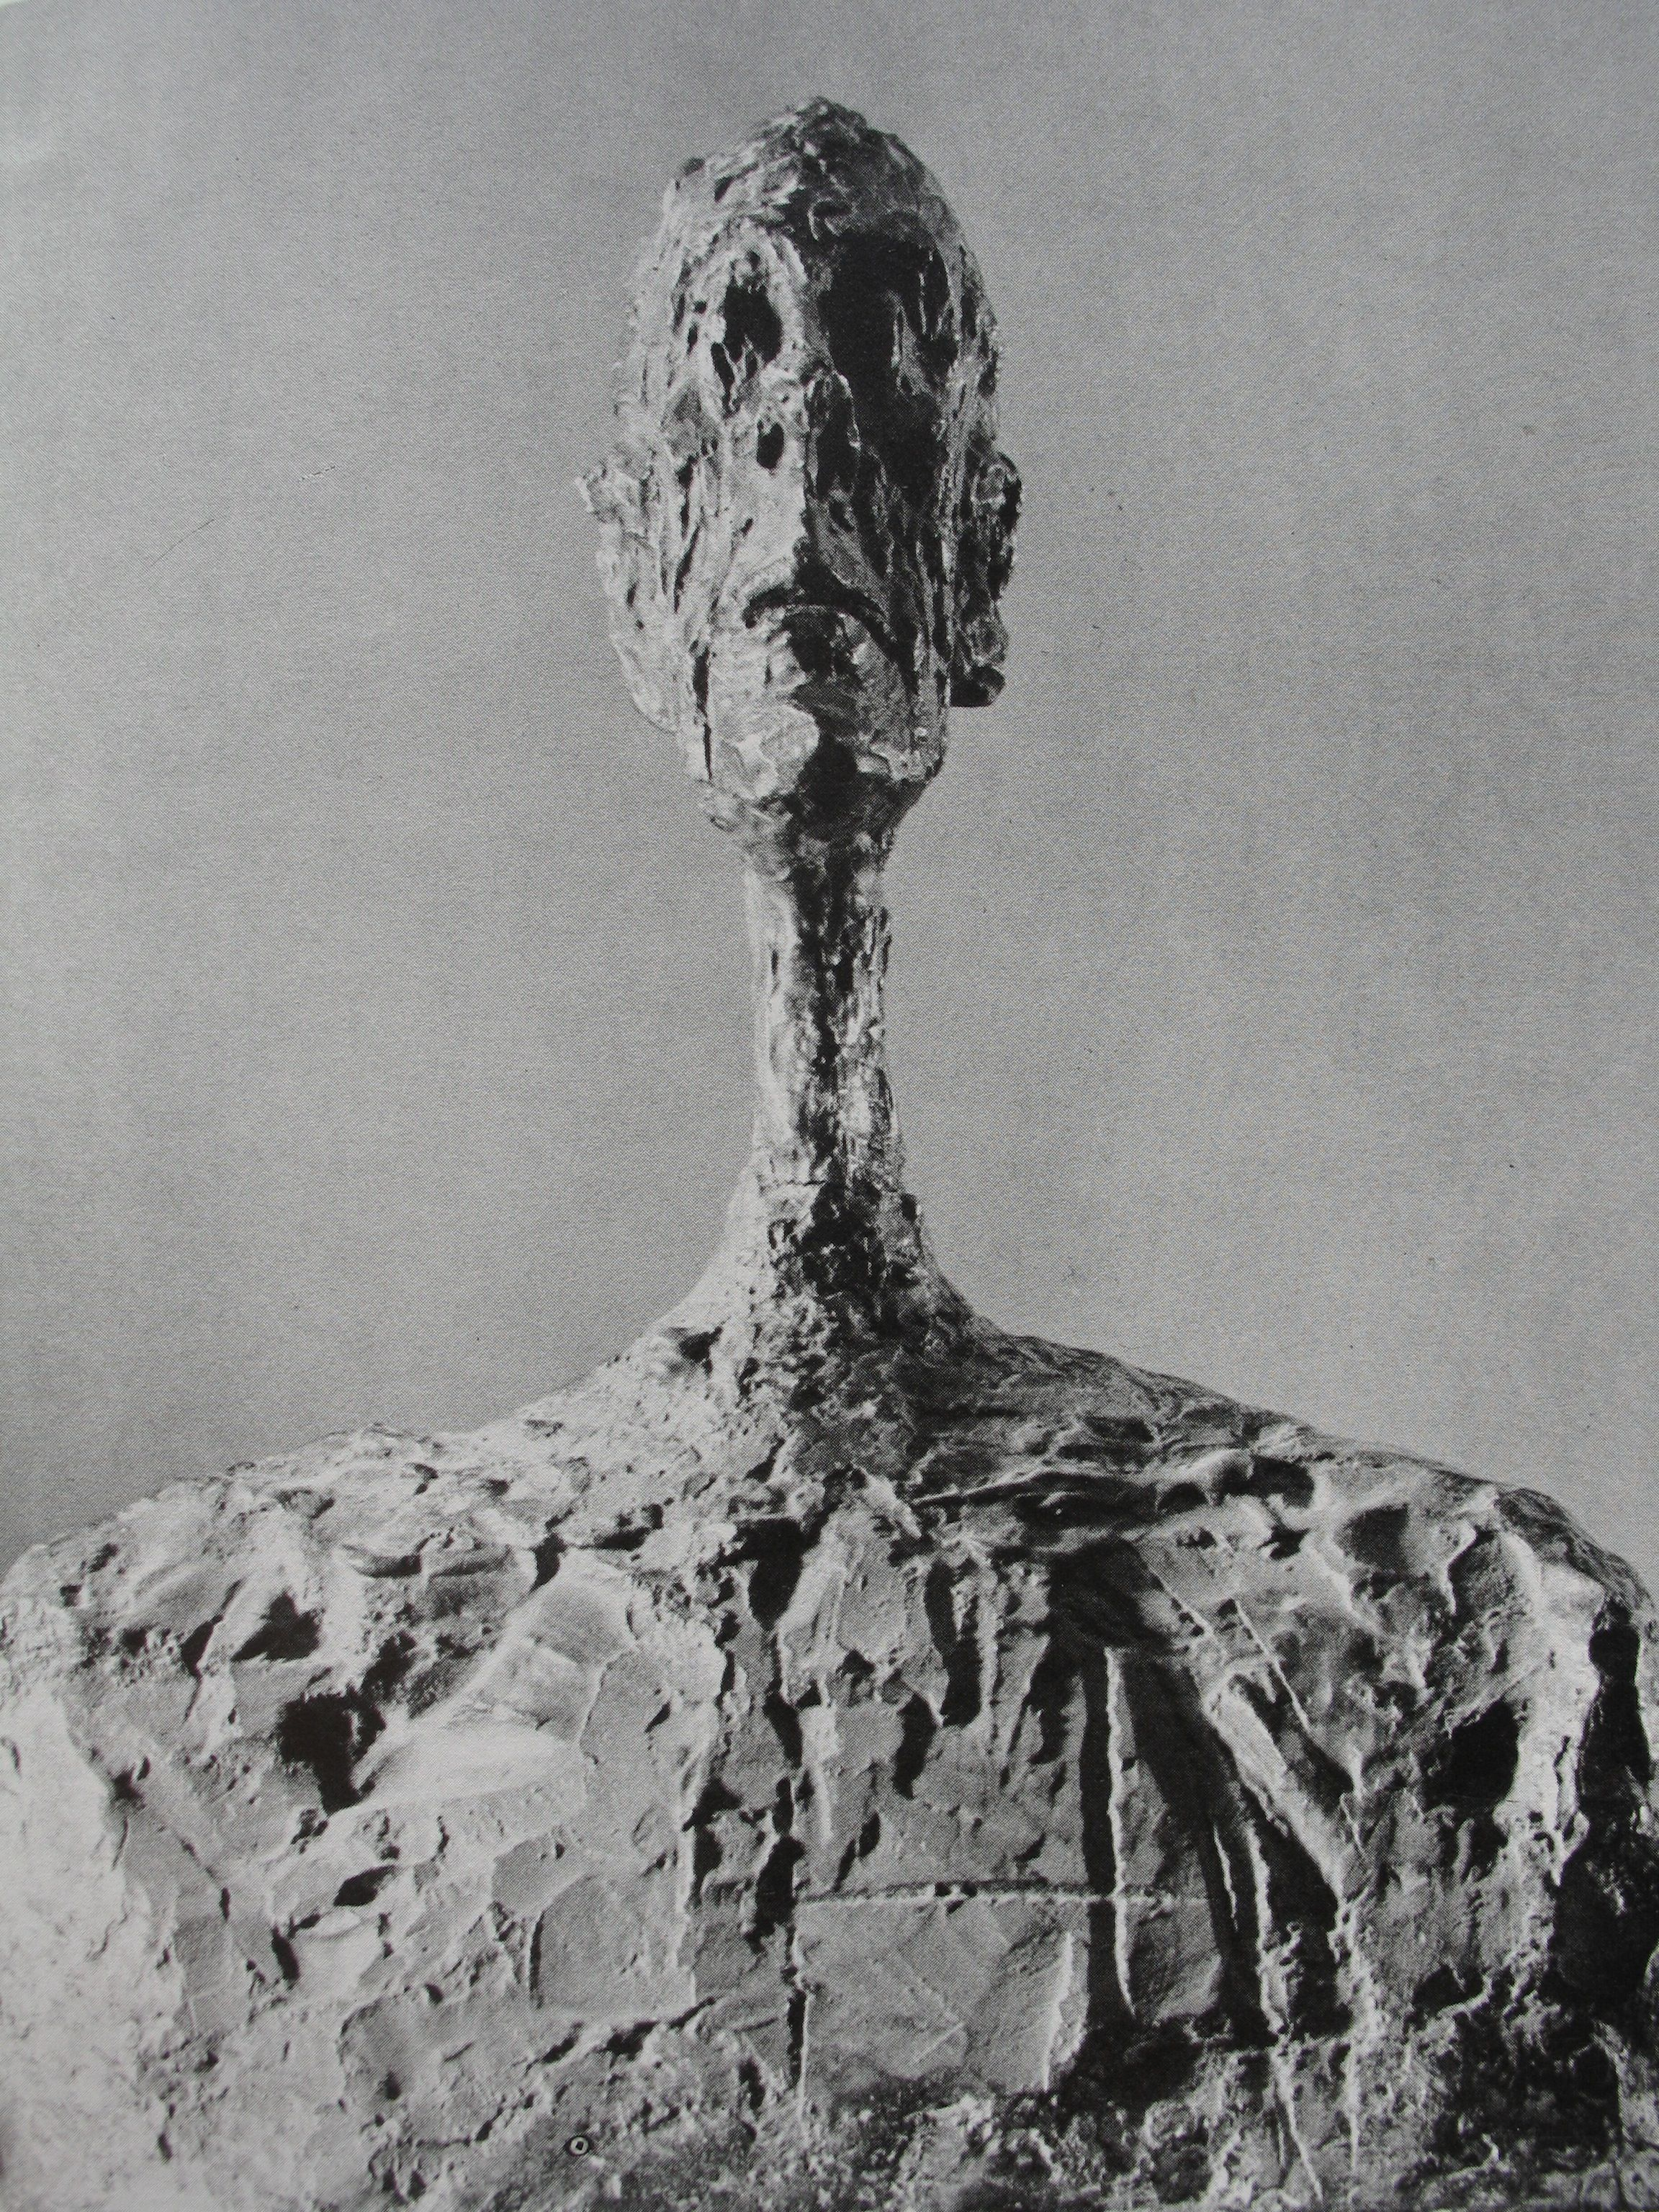 Alberto Giacometti among The Great Masters   ArtVision360